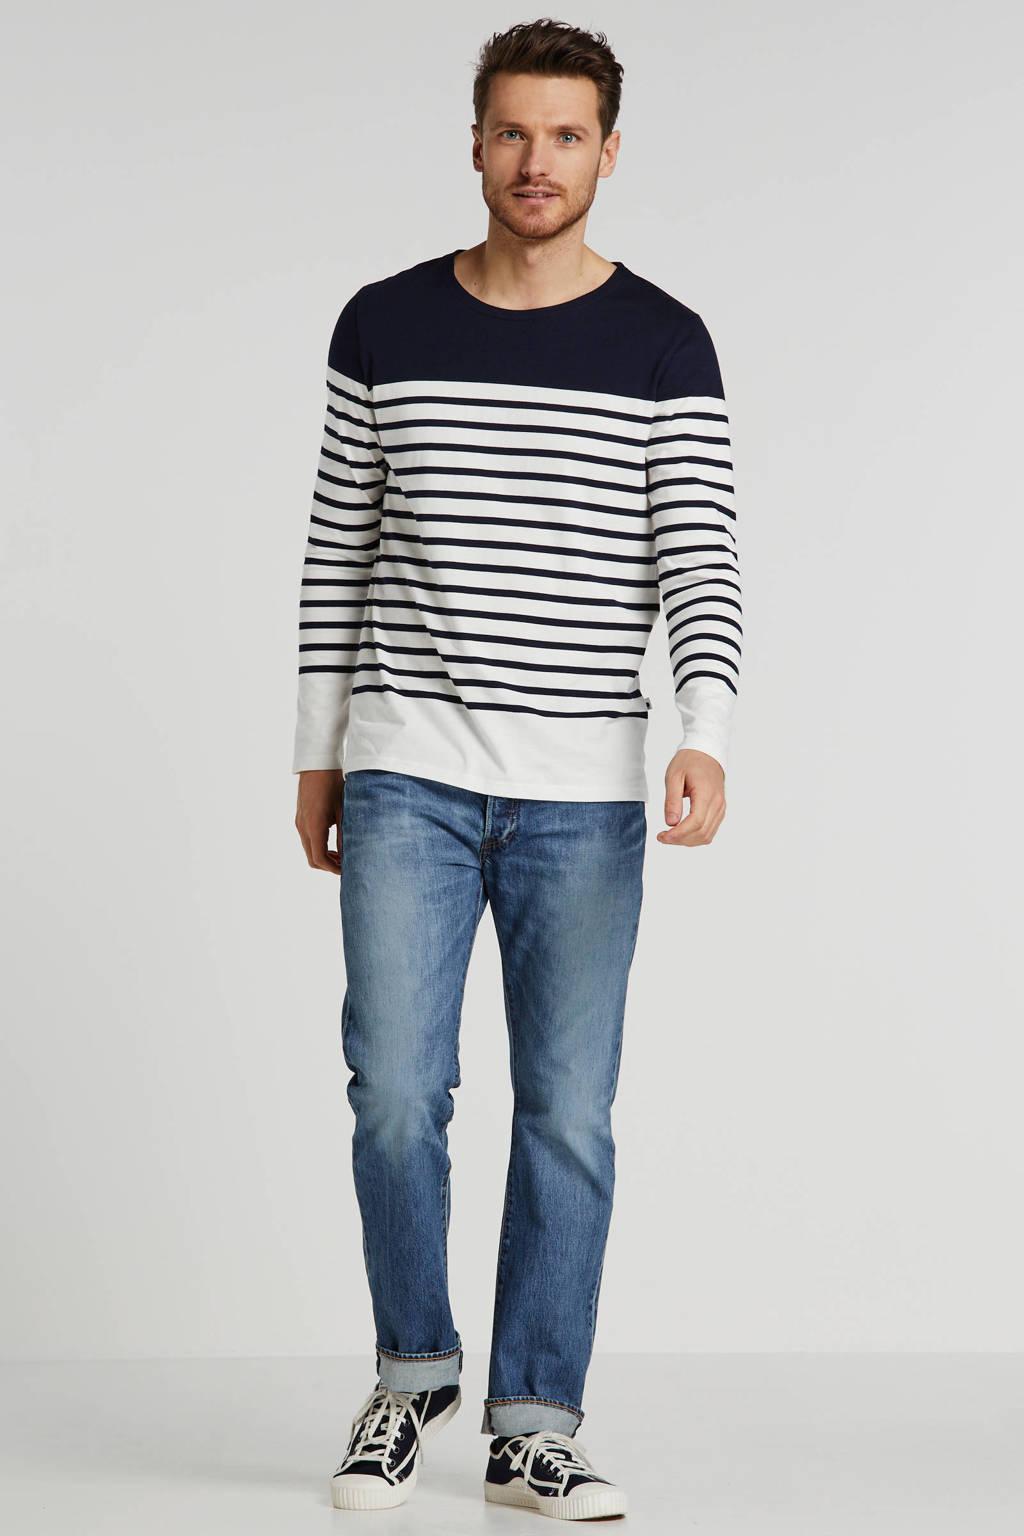 J.C. Rags gestreept T-shirt donkerblauw/wit, Donkerblauw/wit